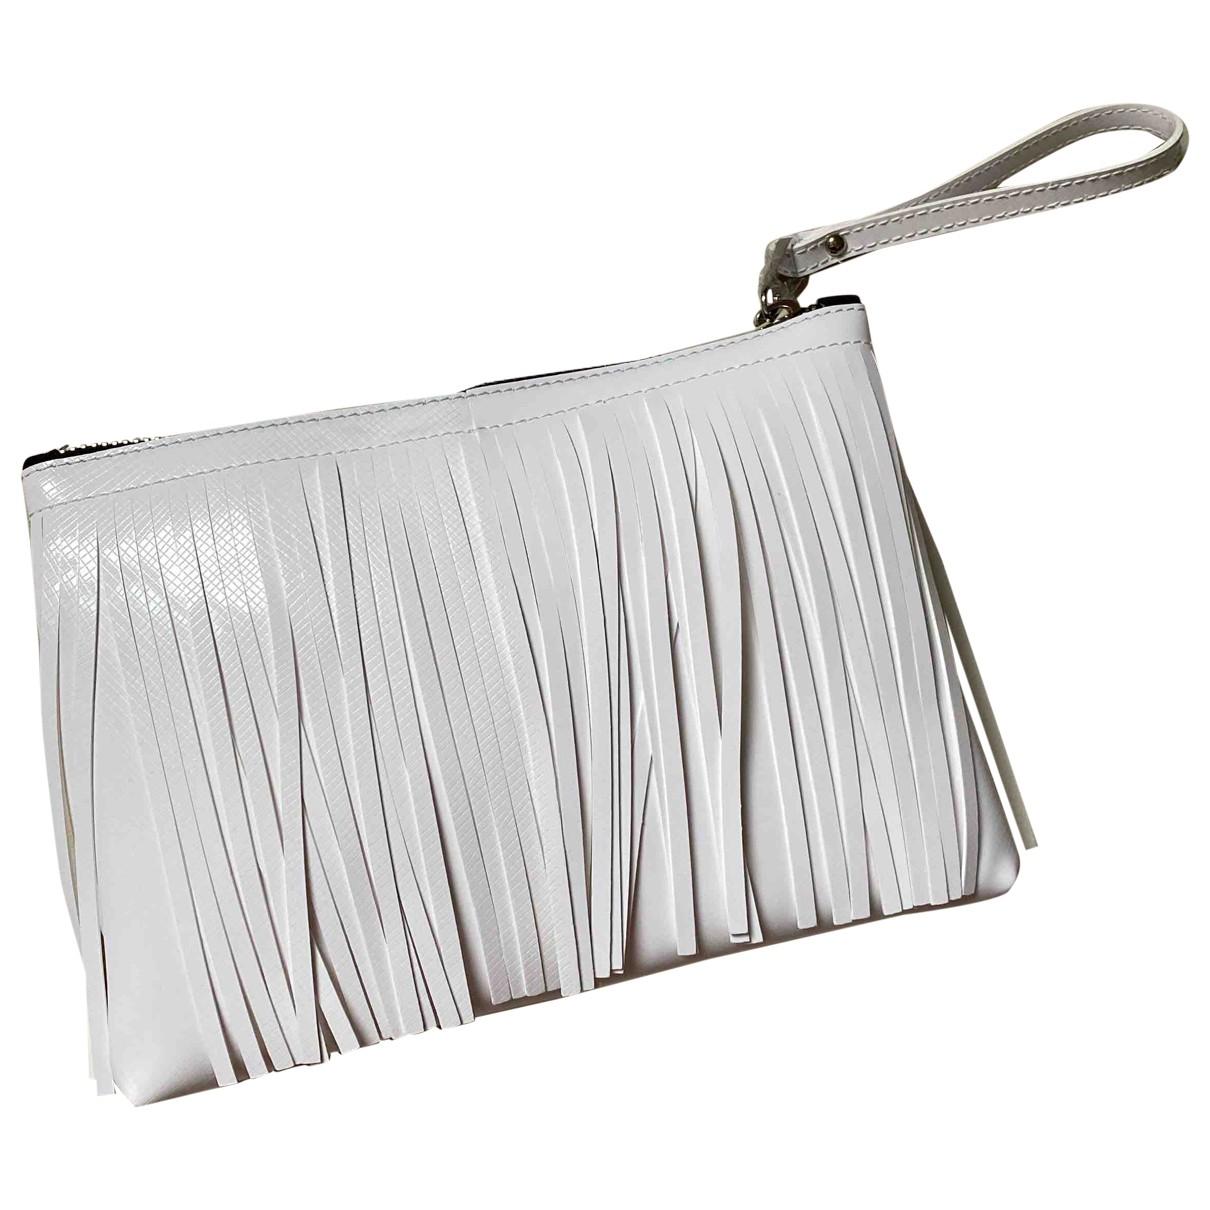 Gianni Chiarini \N White Patent leather Clutch bag for Women \N